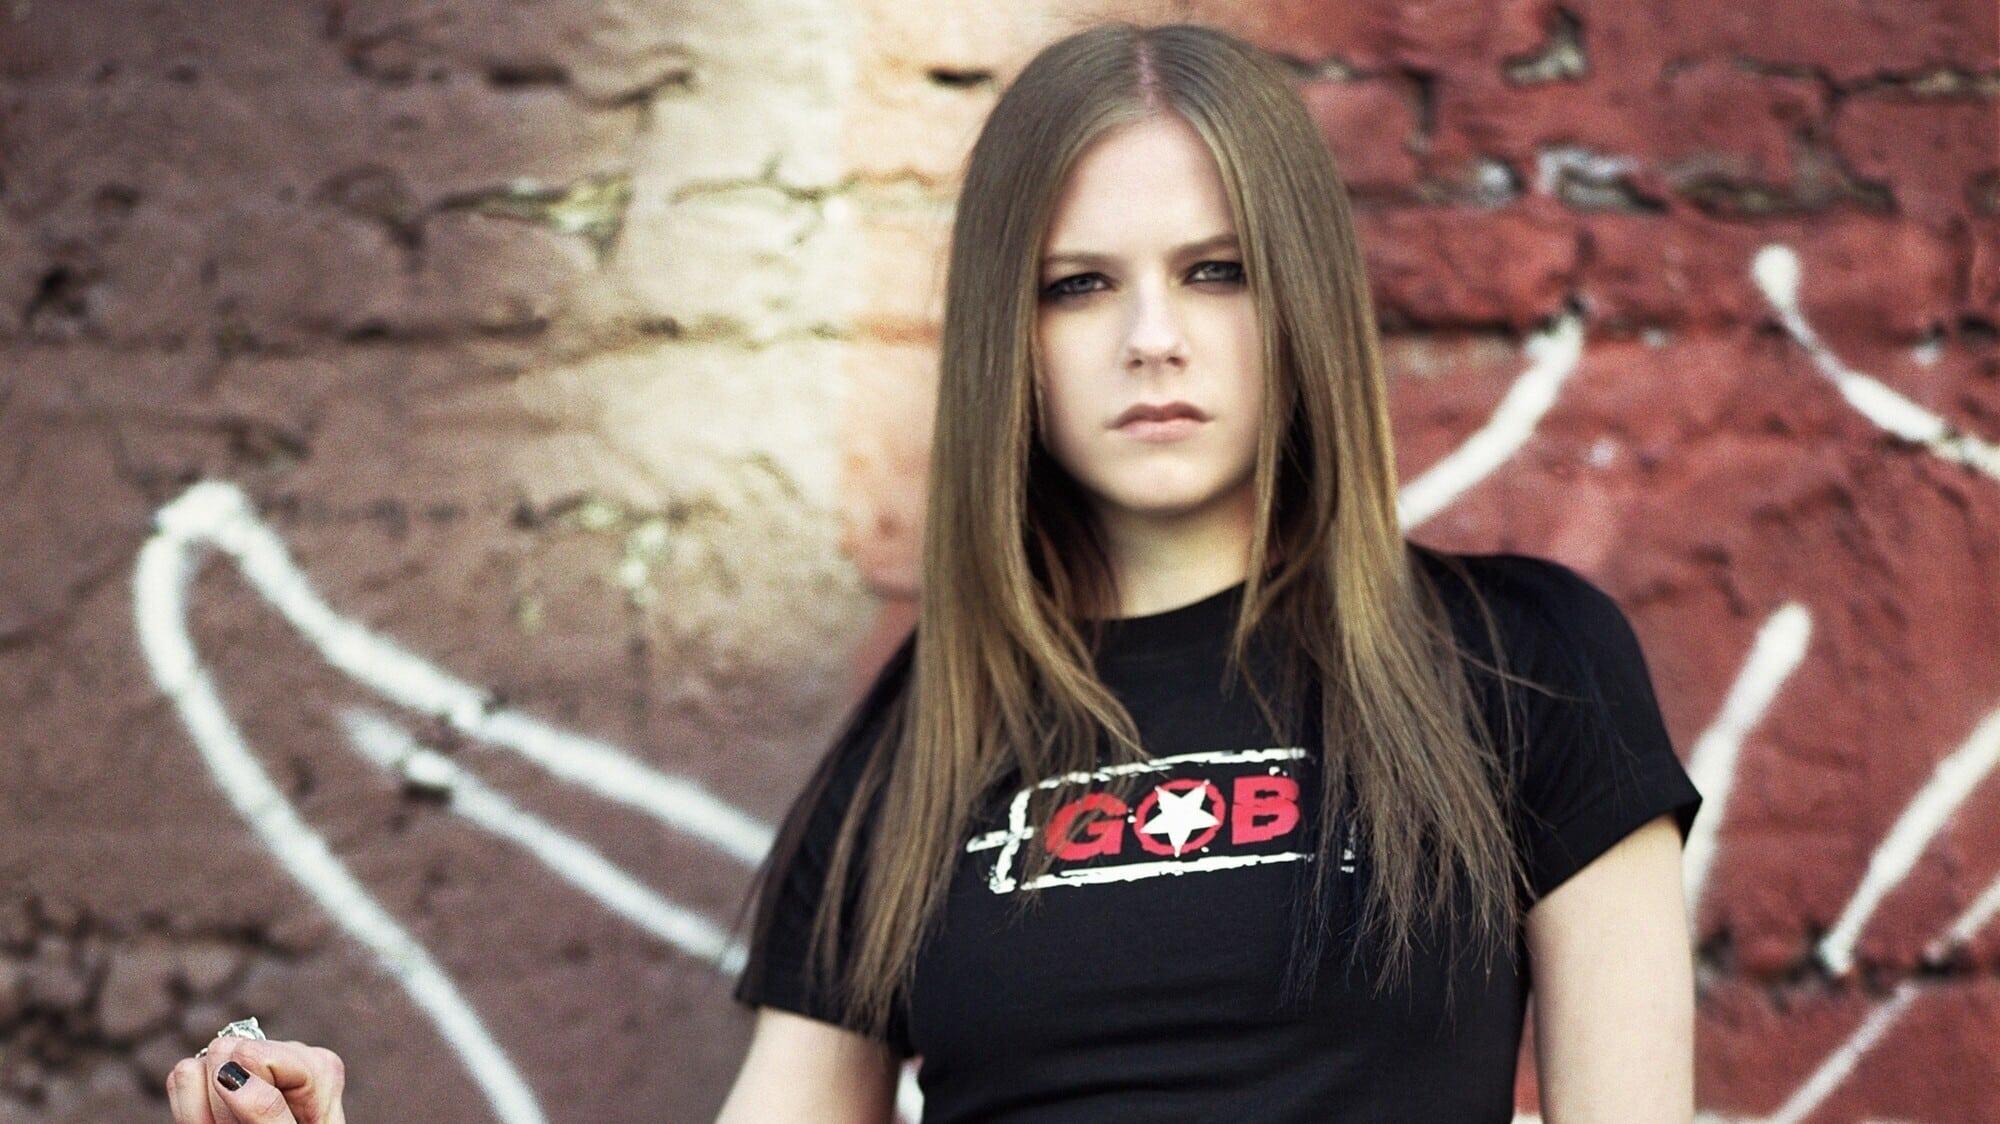 Avril Lavigne: My World (2003)